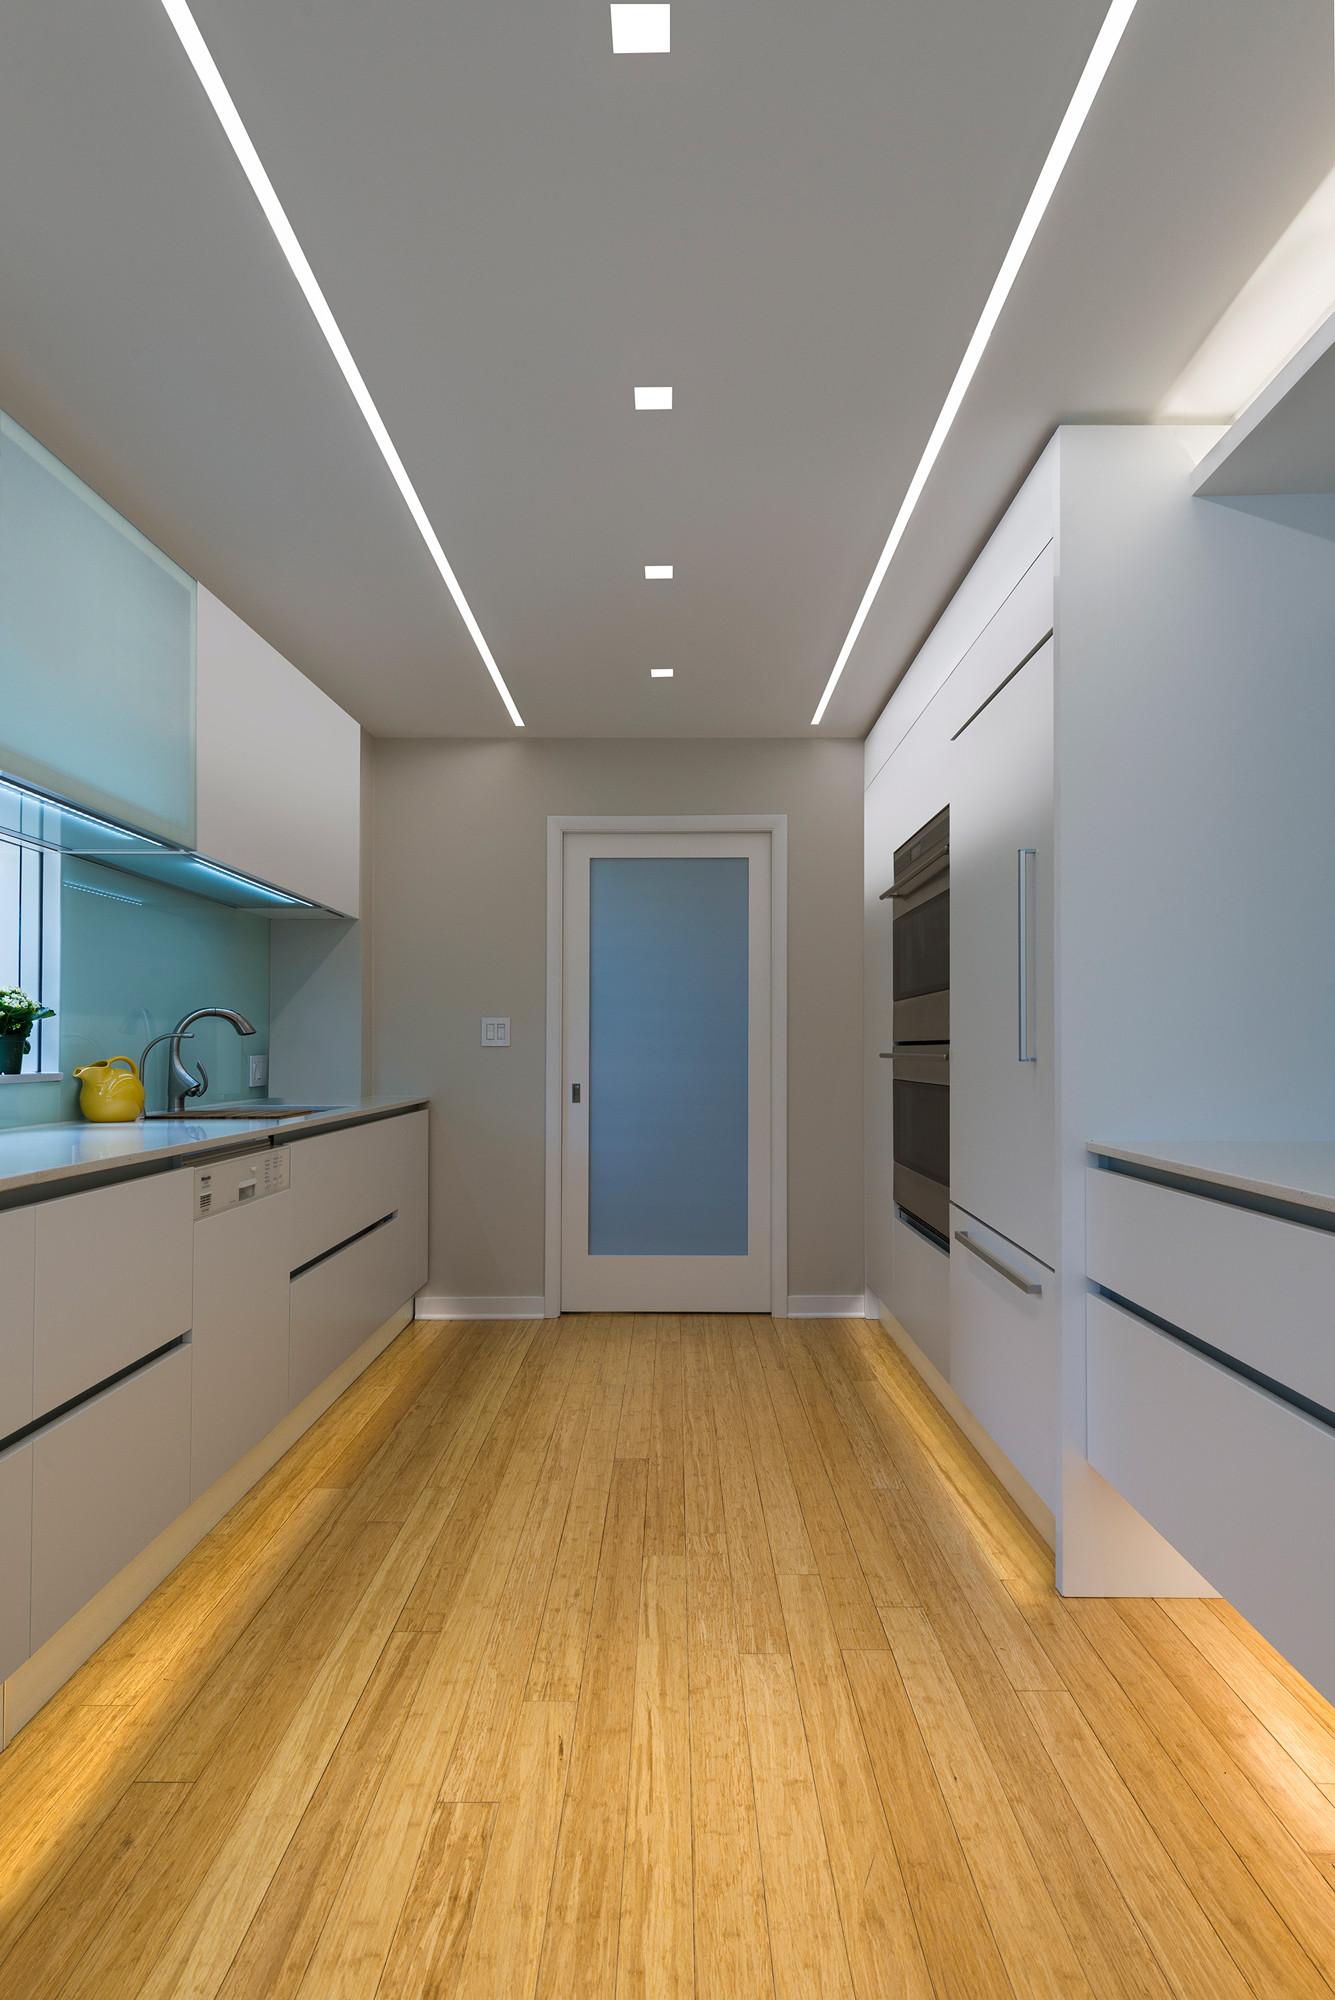 Custom Kitchen Lighting and Design Downtown Charleston SC